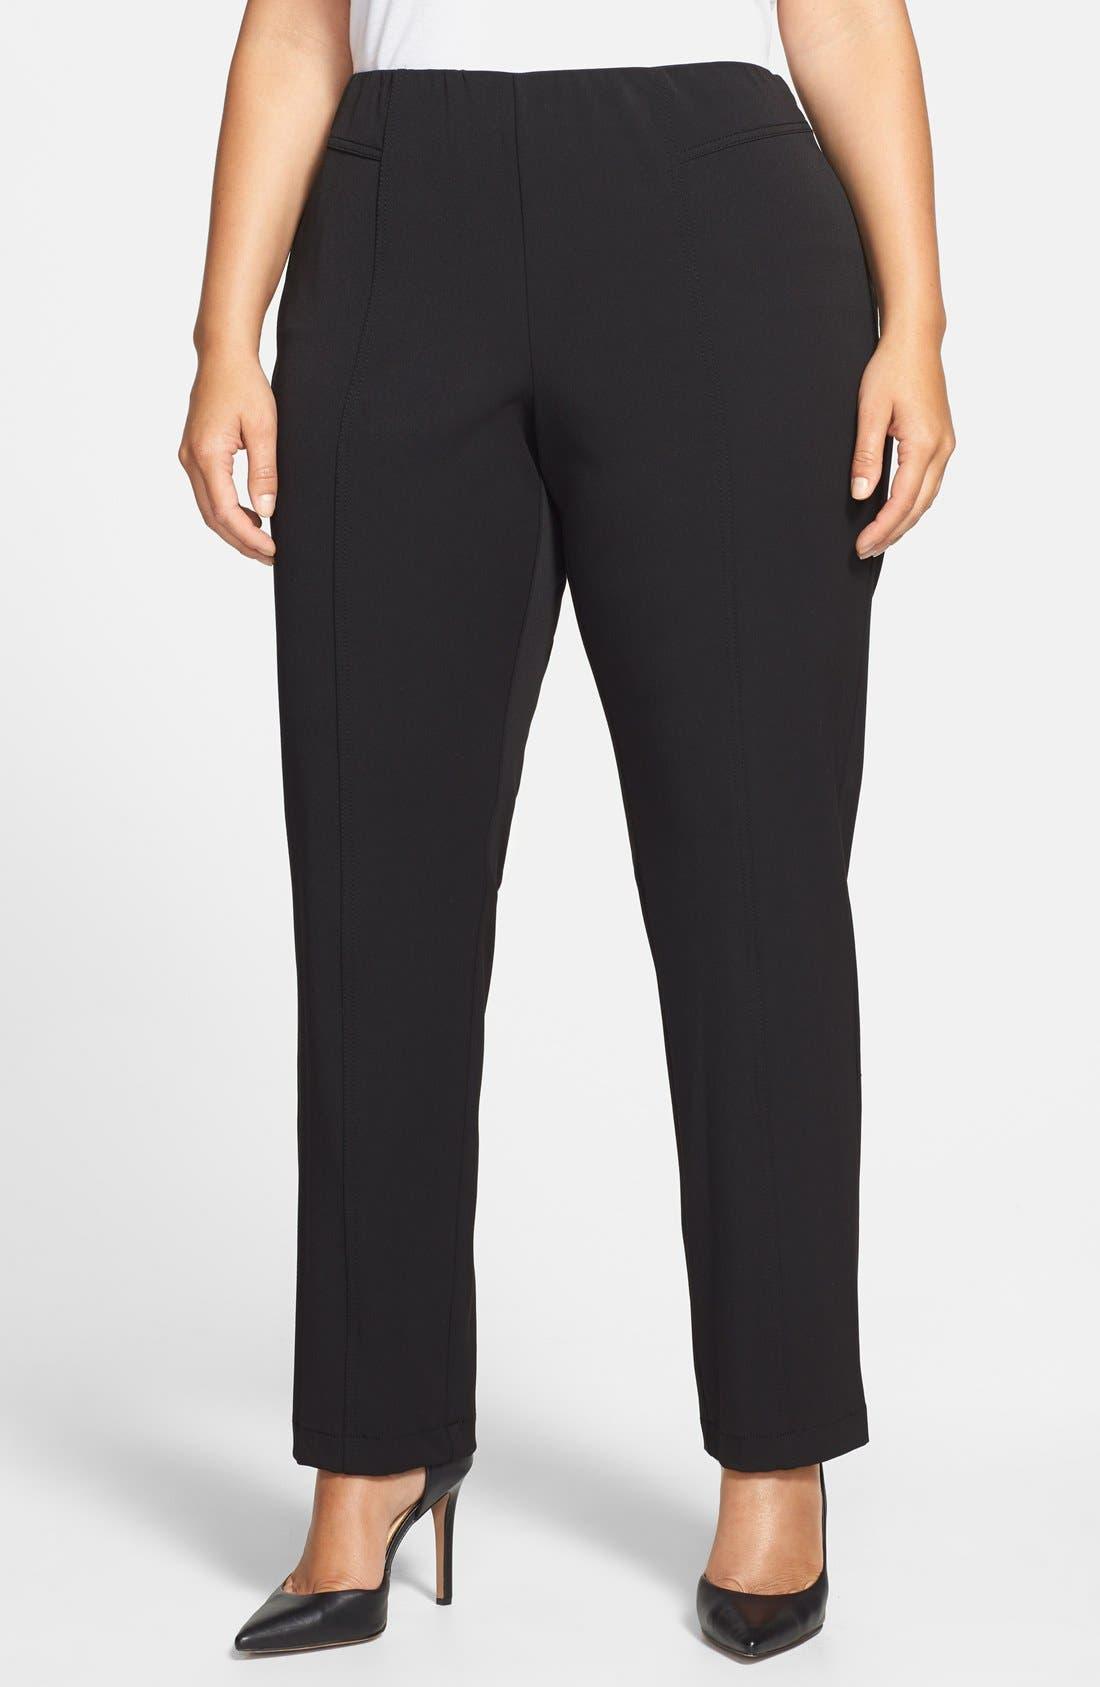 Seam Detail Pants,                             Main thumbnail 1, color,                             RICH BLACK